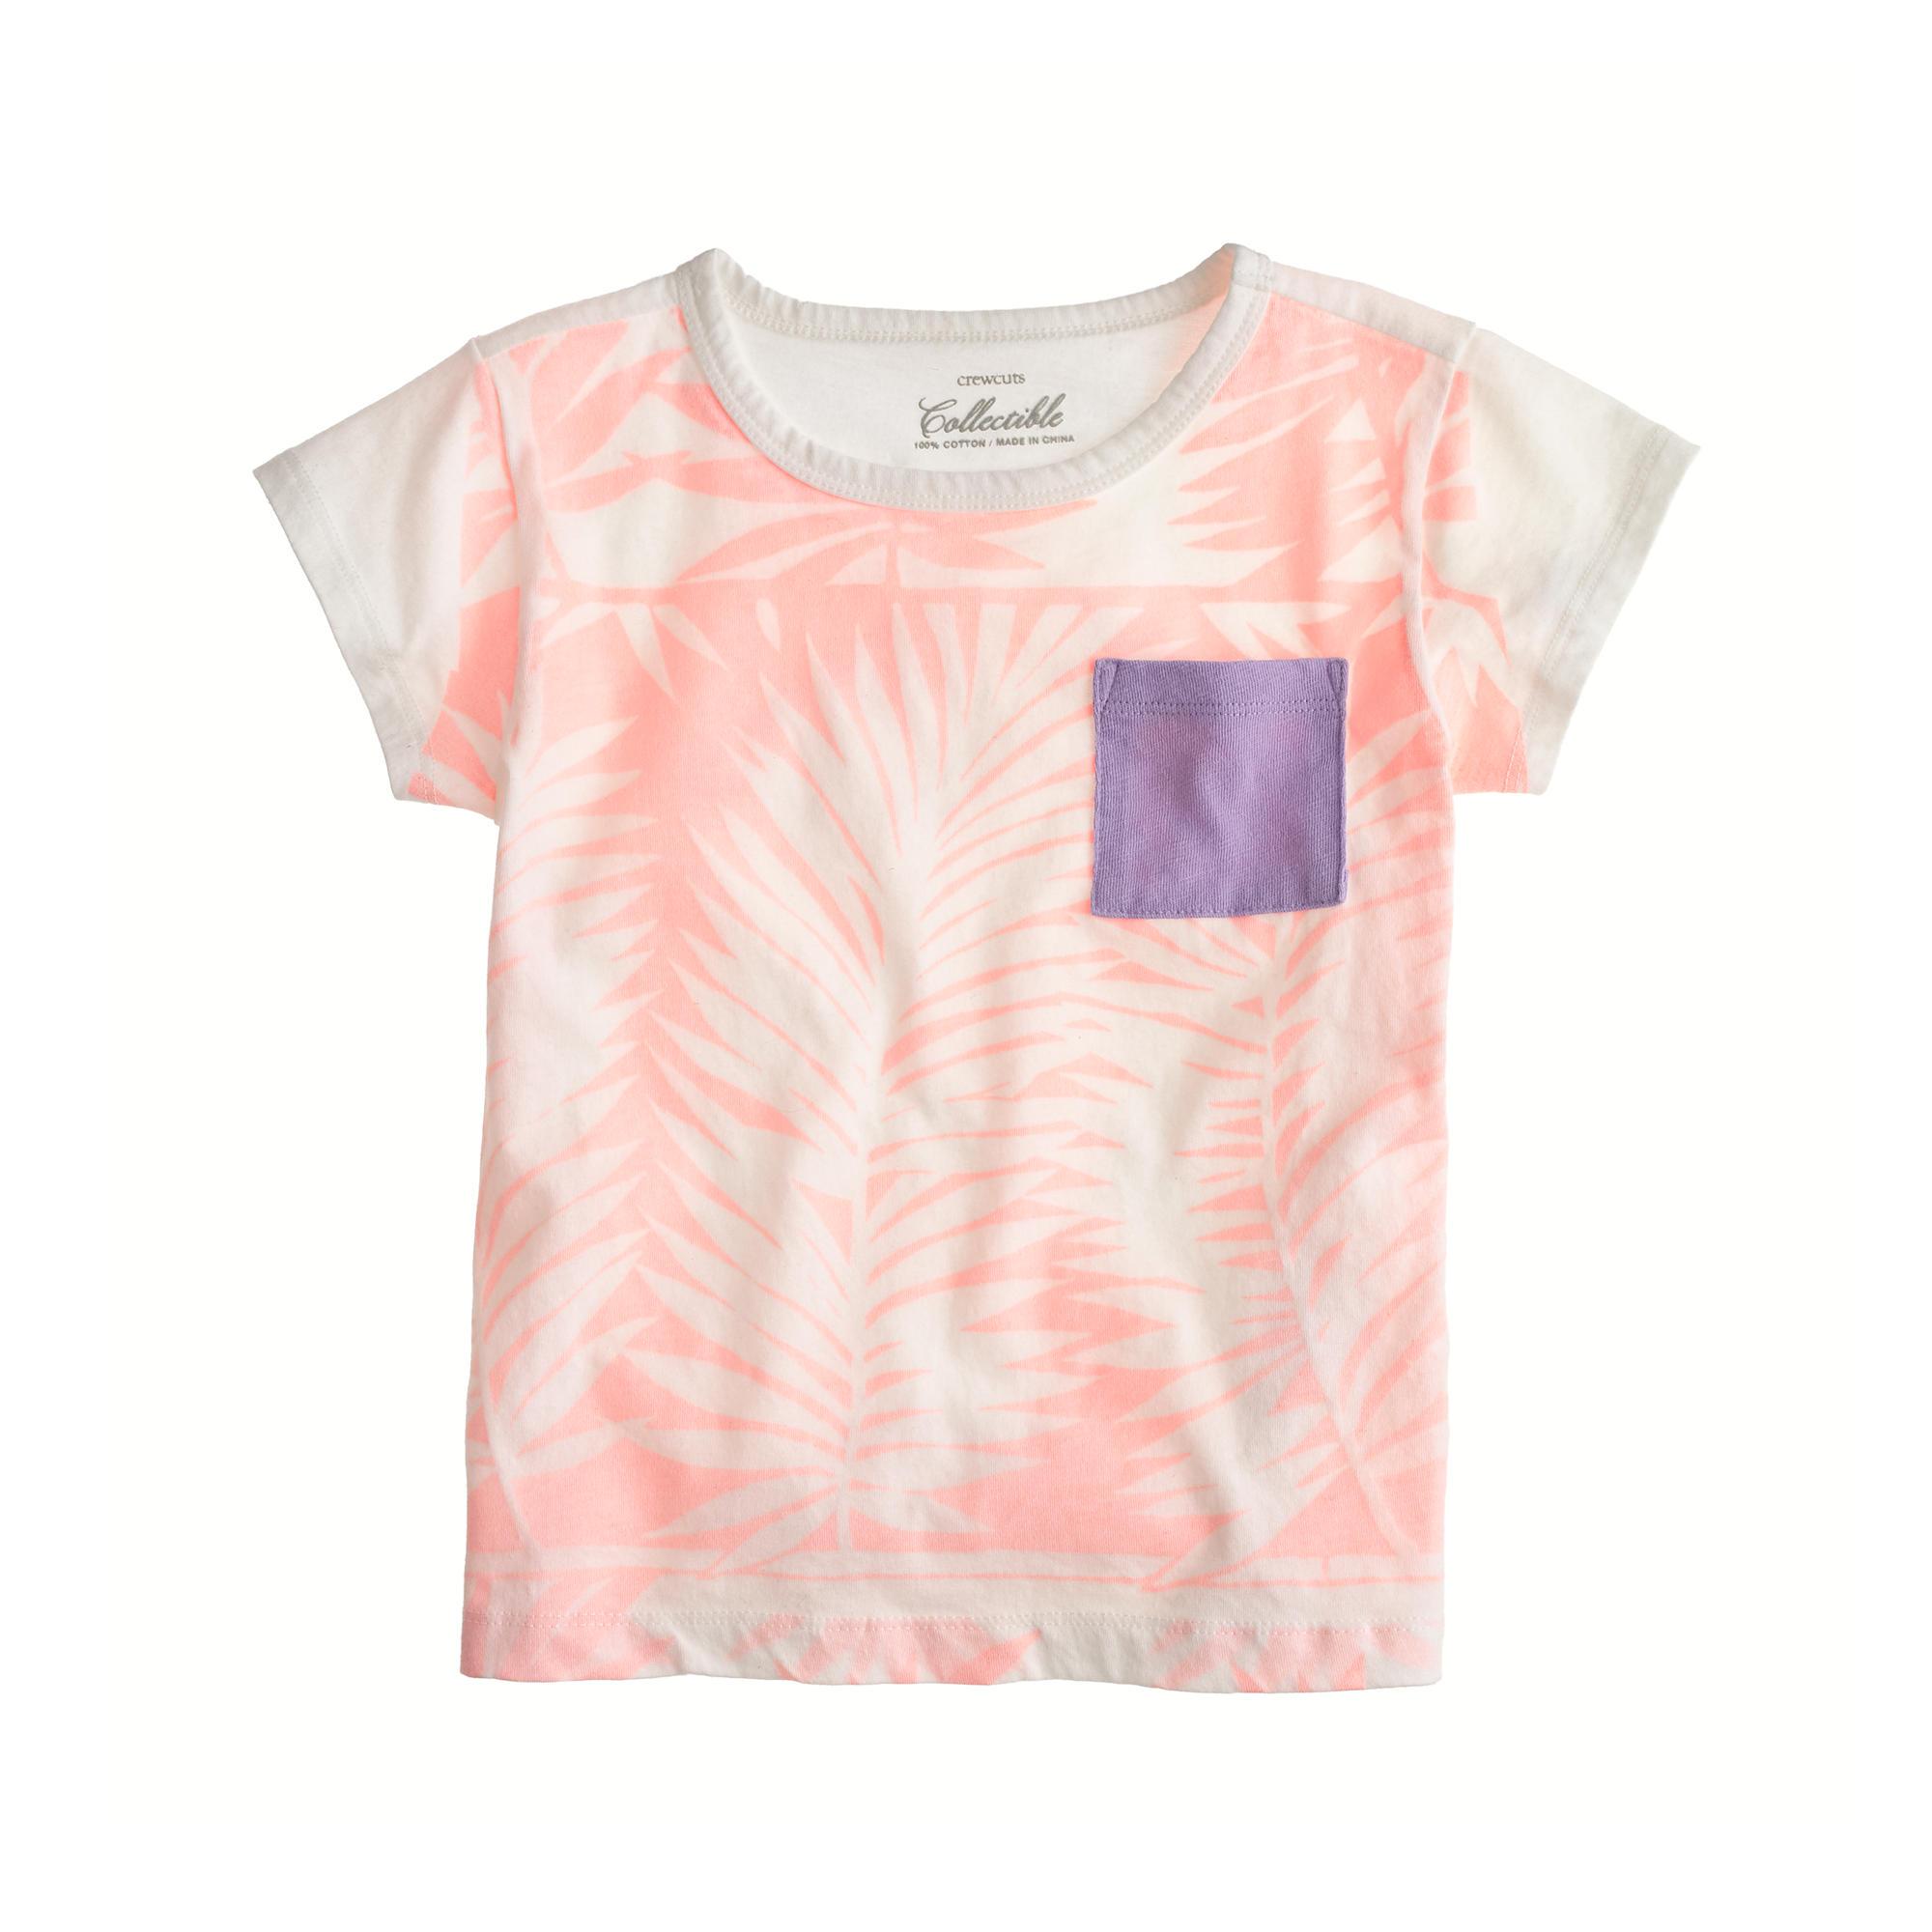 Girls 39 Palm Print Pocket T Shirt J Crew